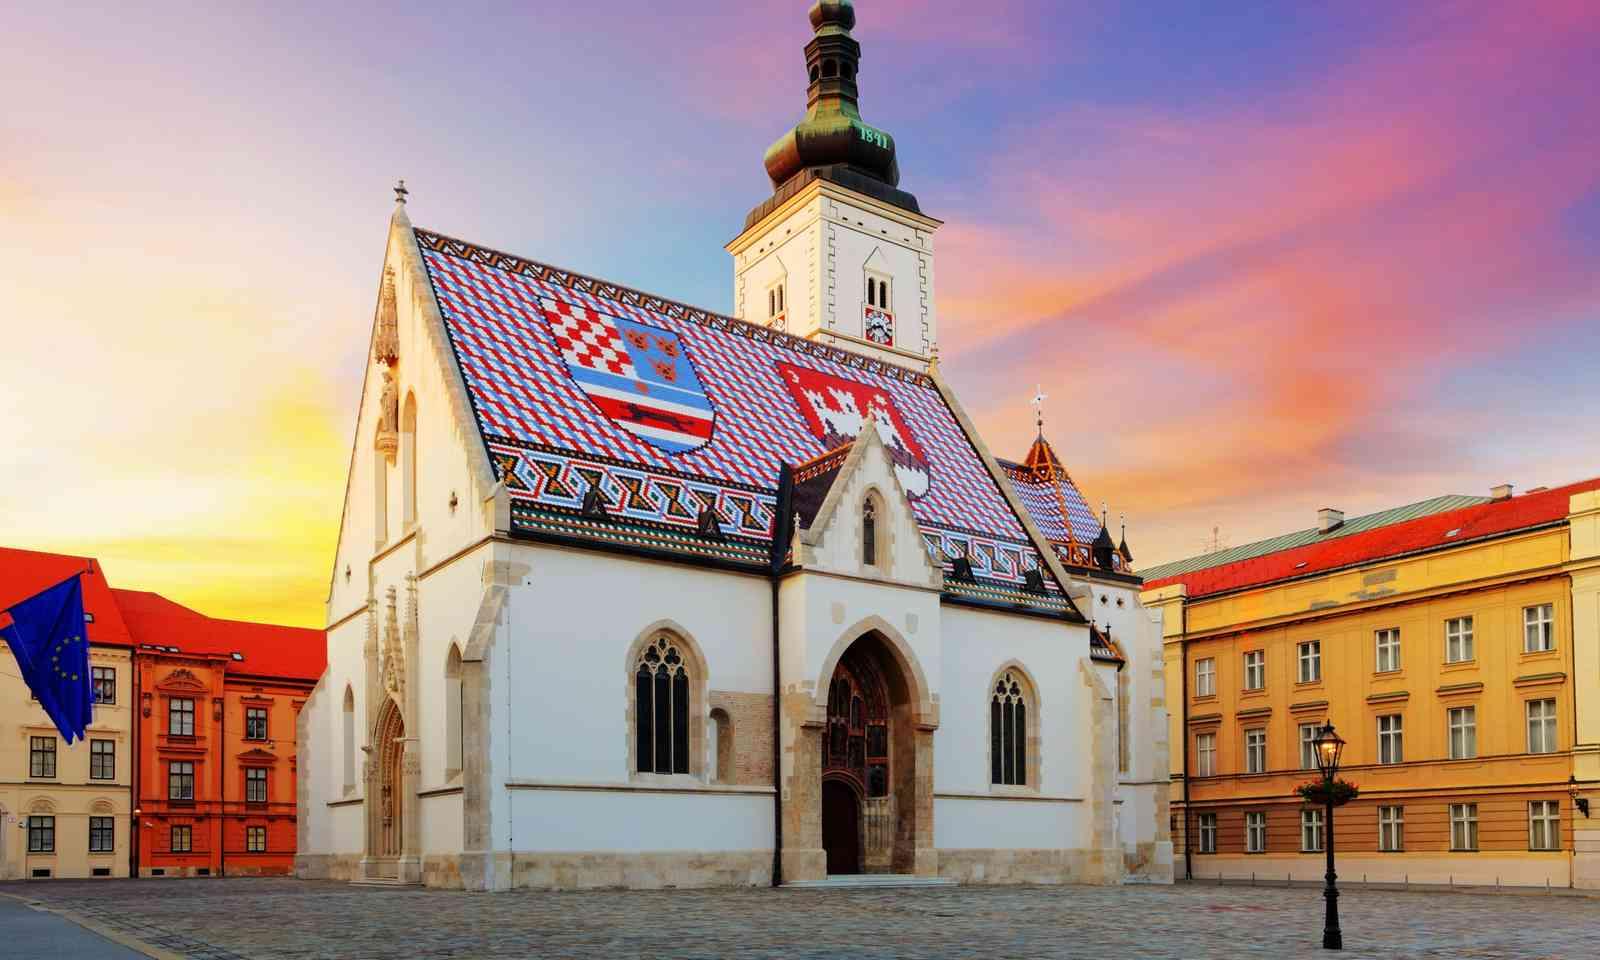 St Mark's Church, Gornji Grad (Dreamstime)